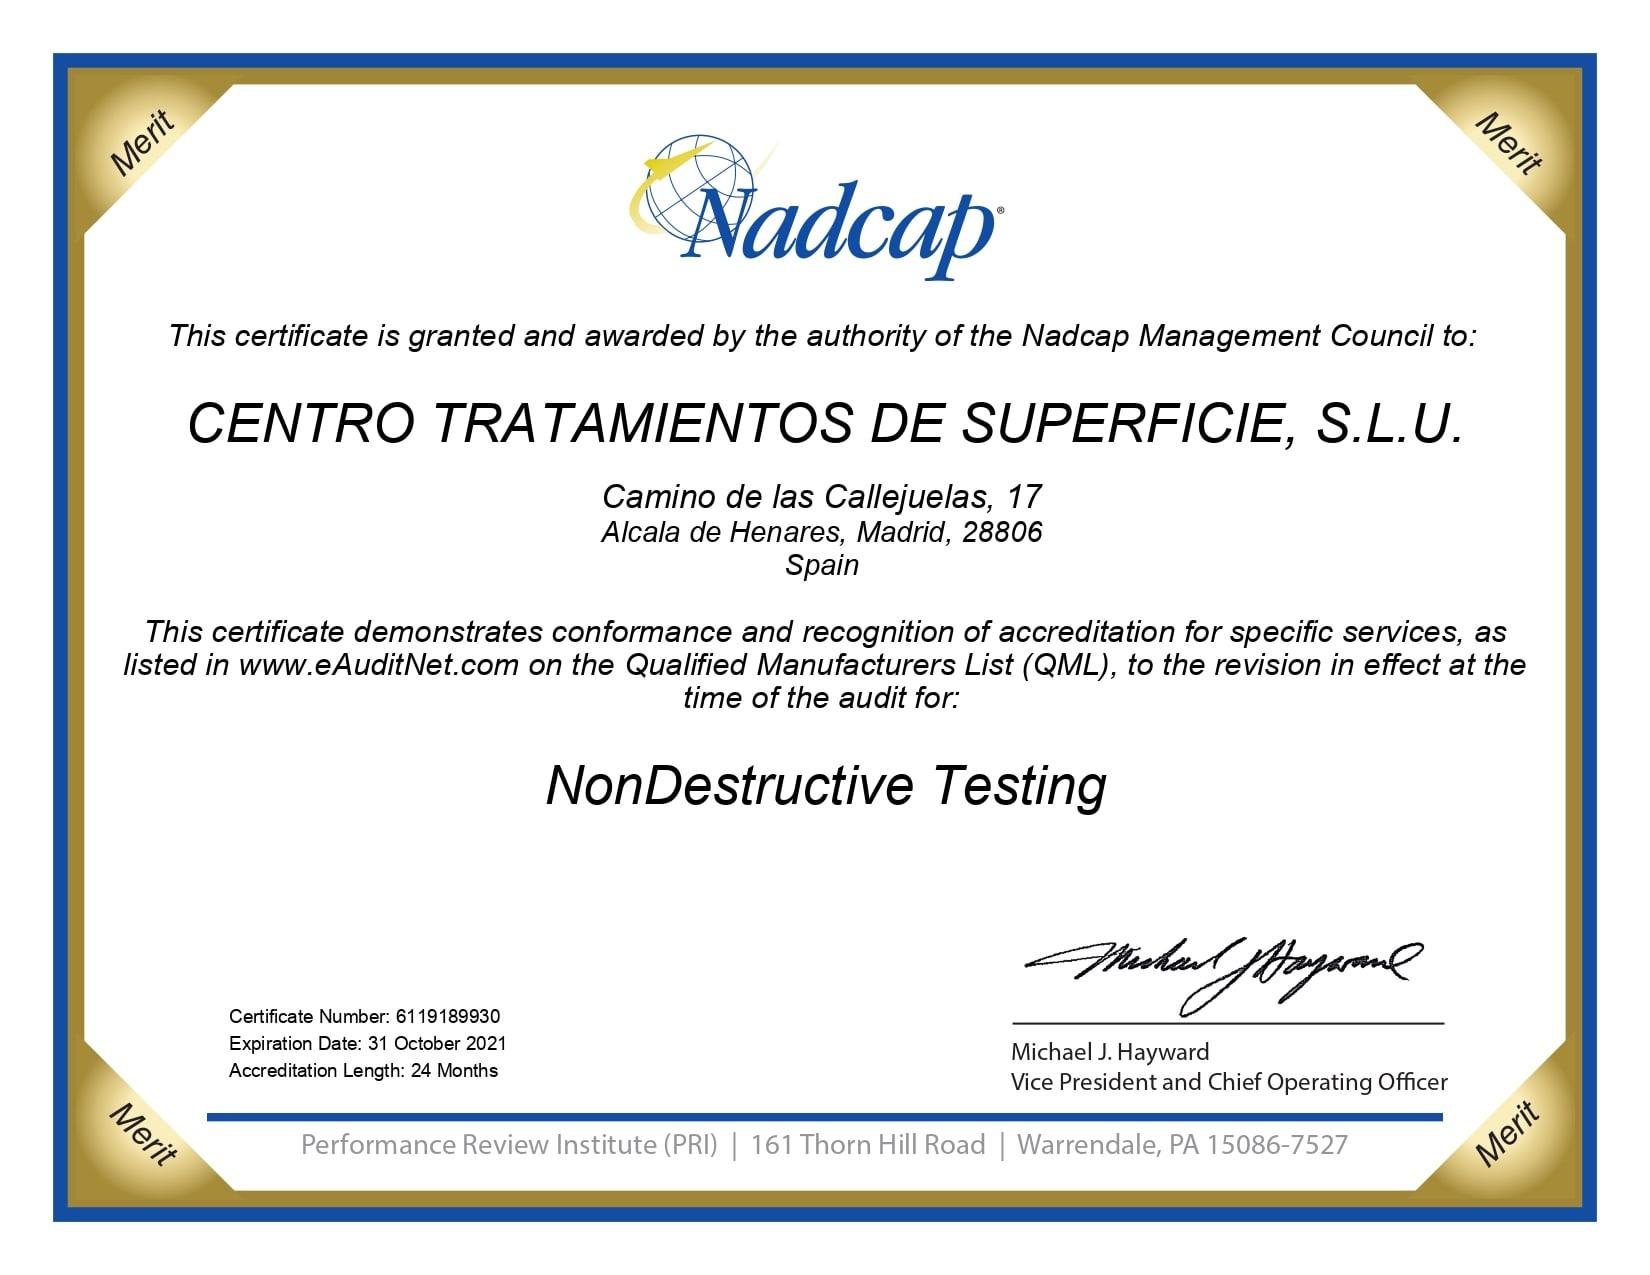 NonDestructive Testing audit 189930 certificate